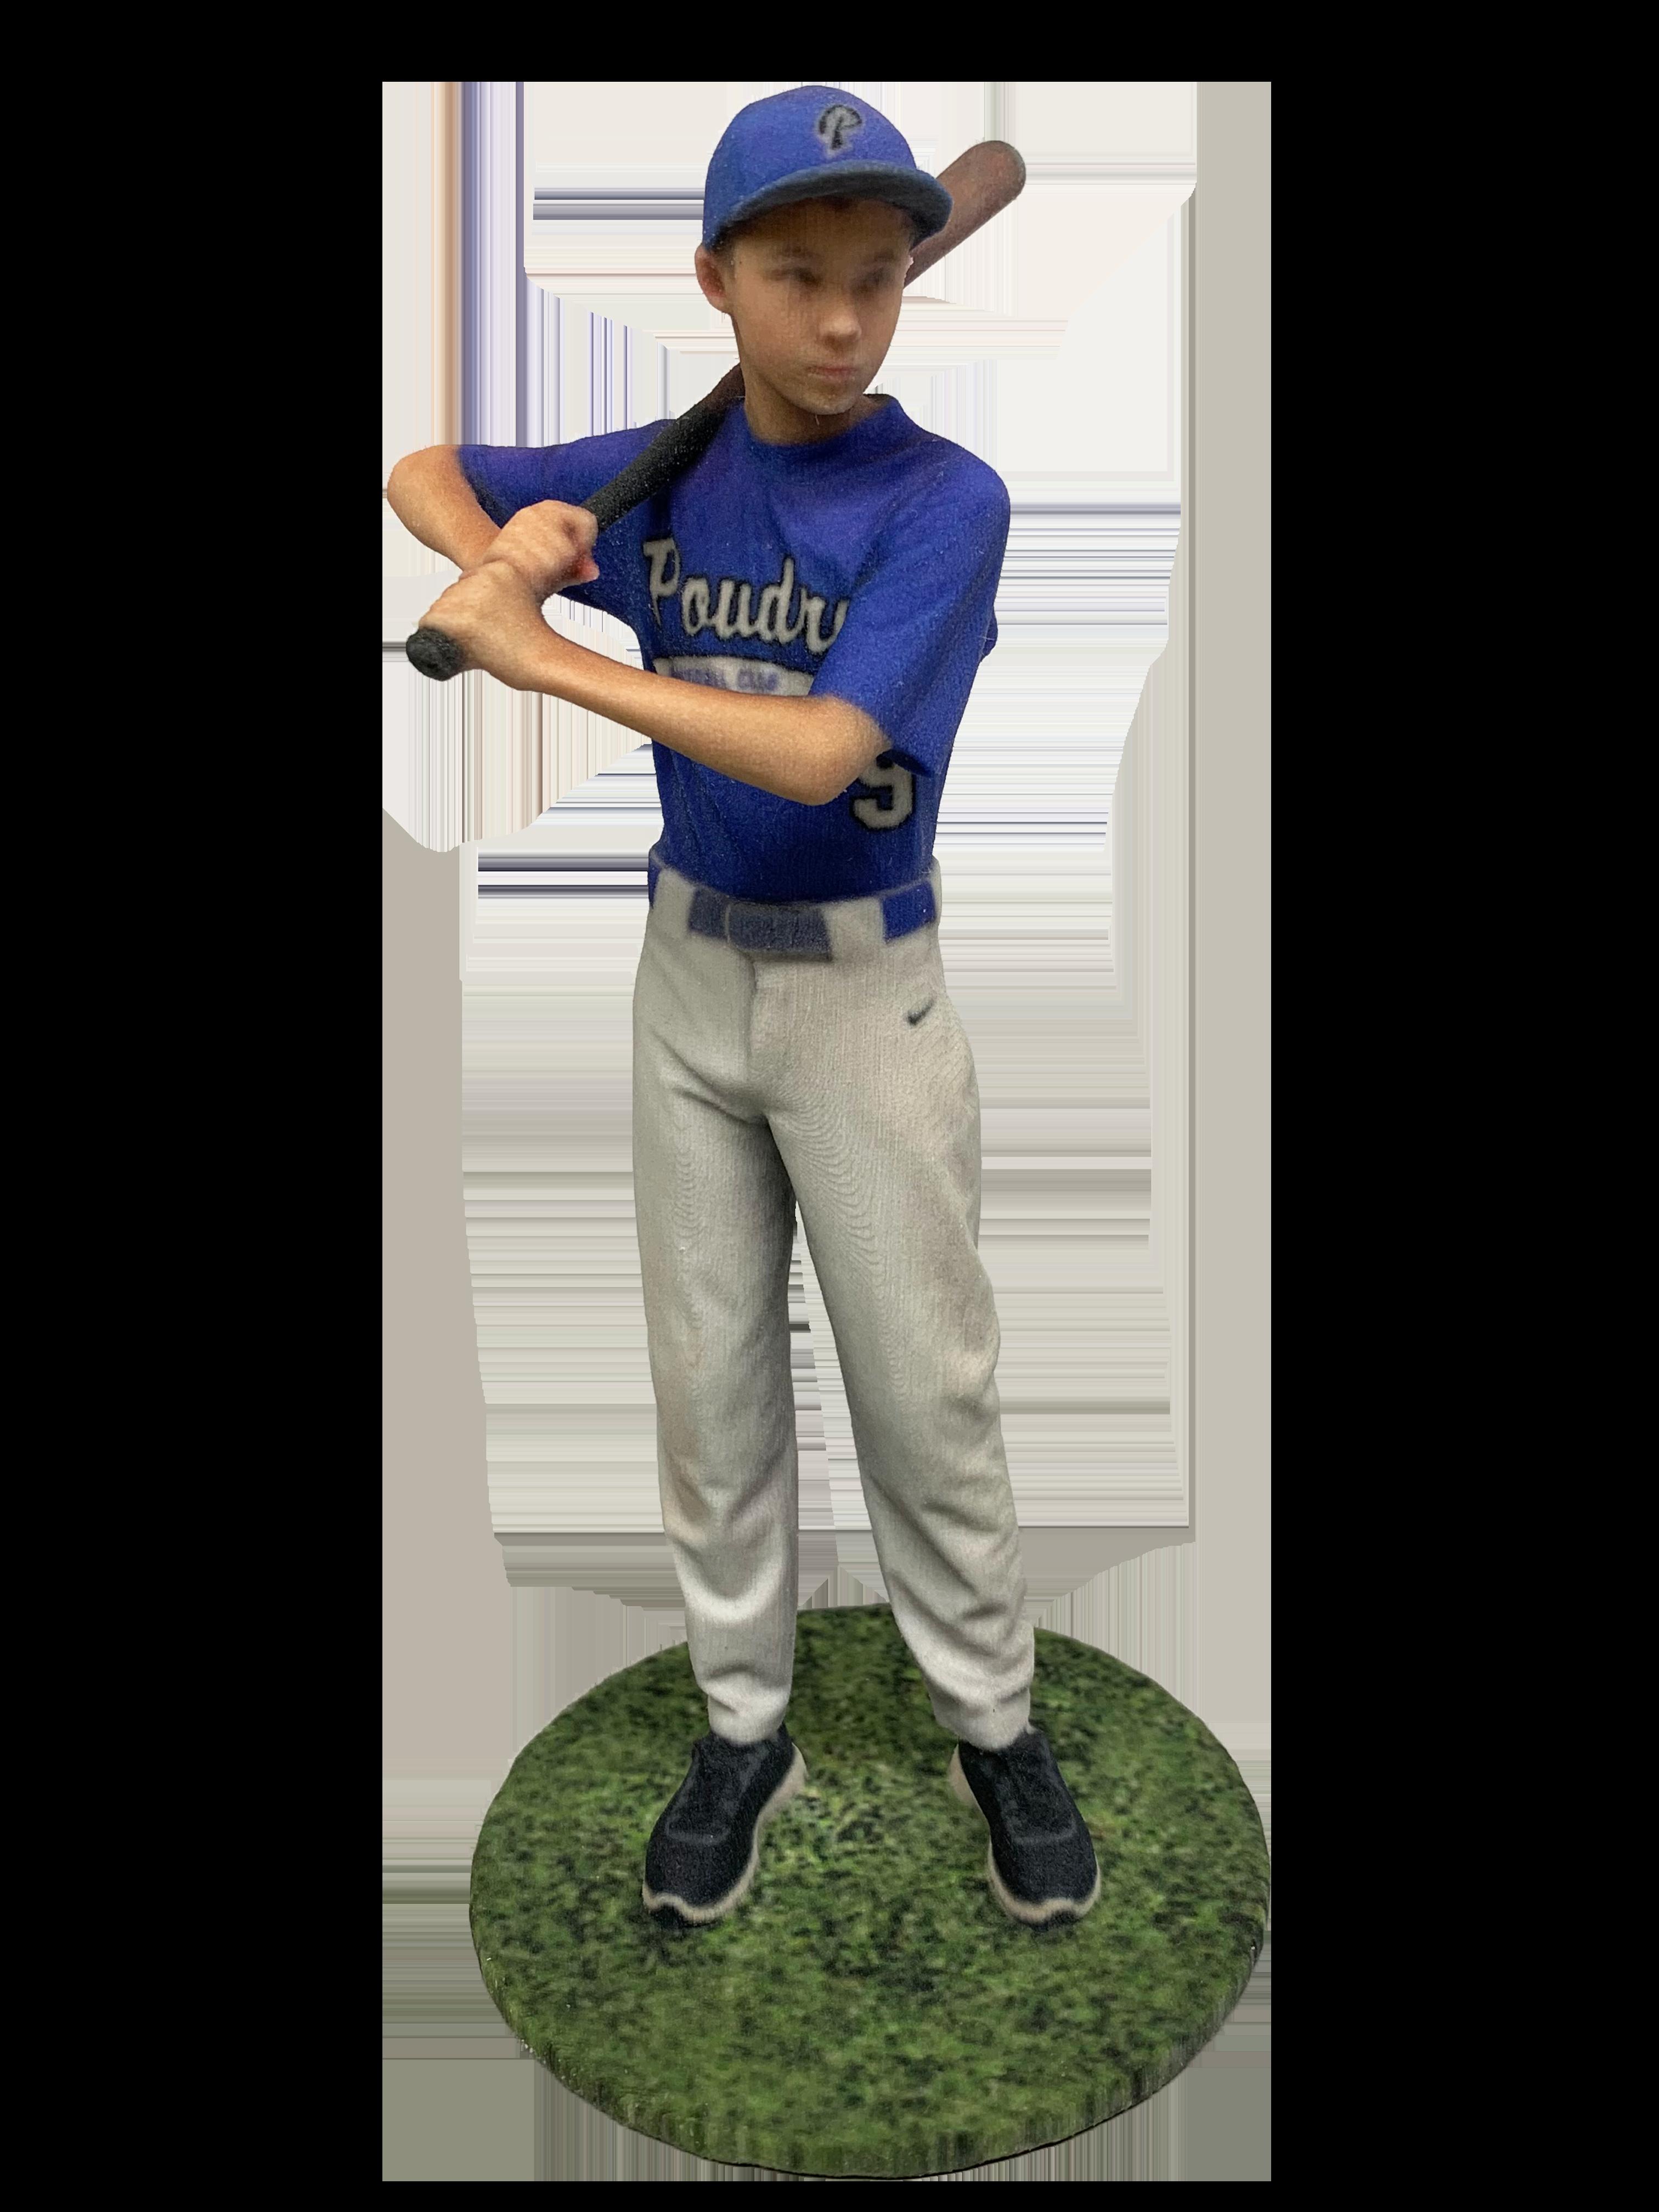 Baseball player figurine